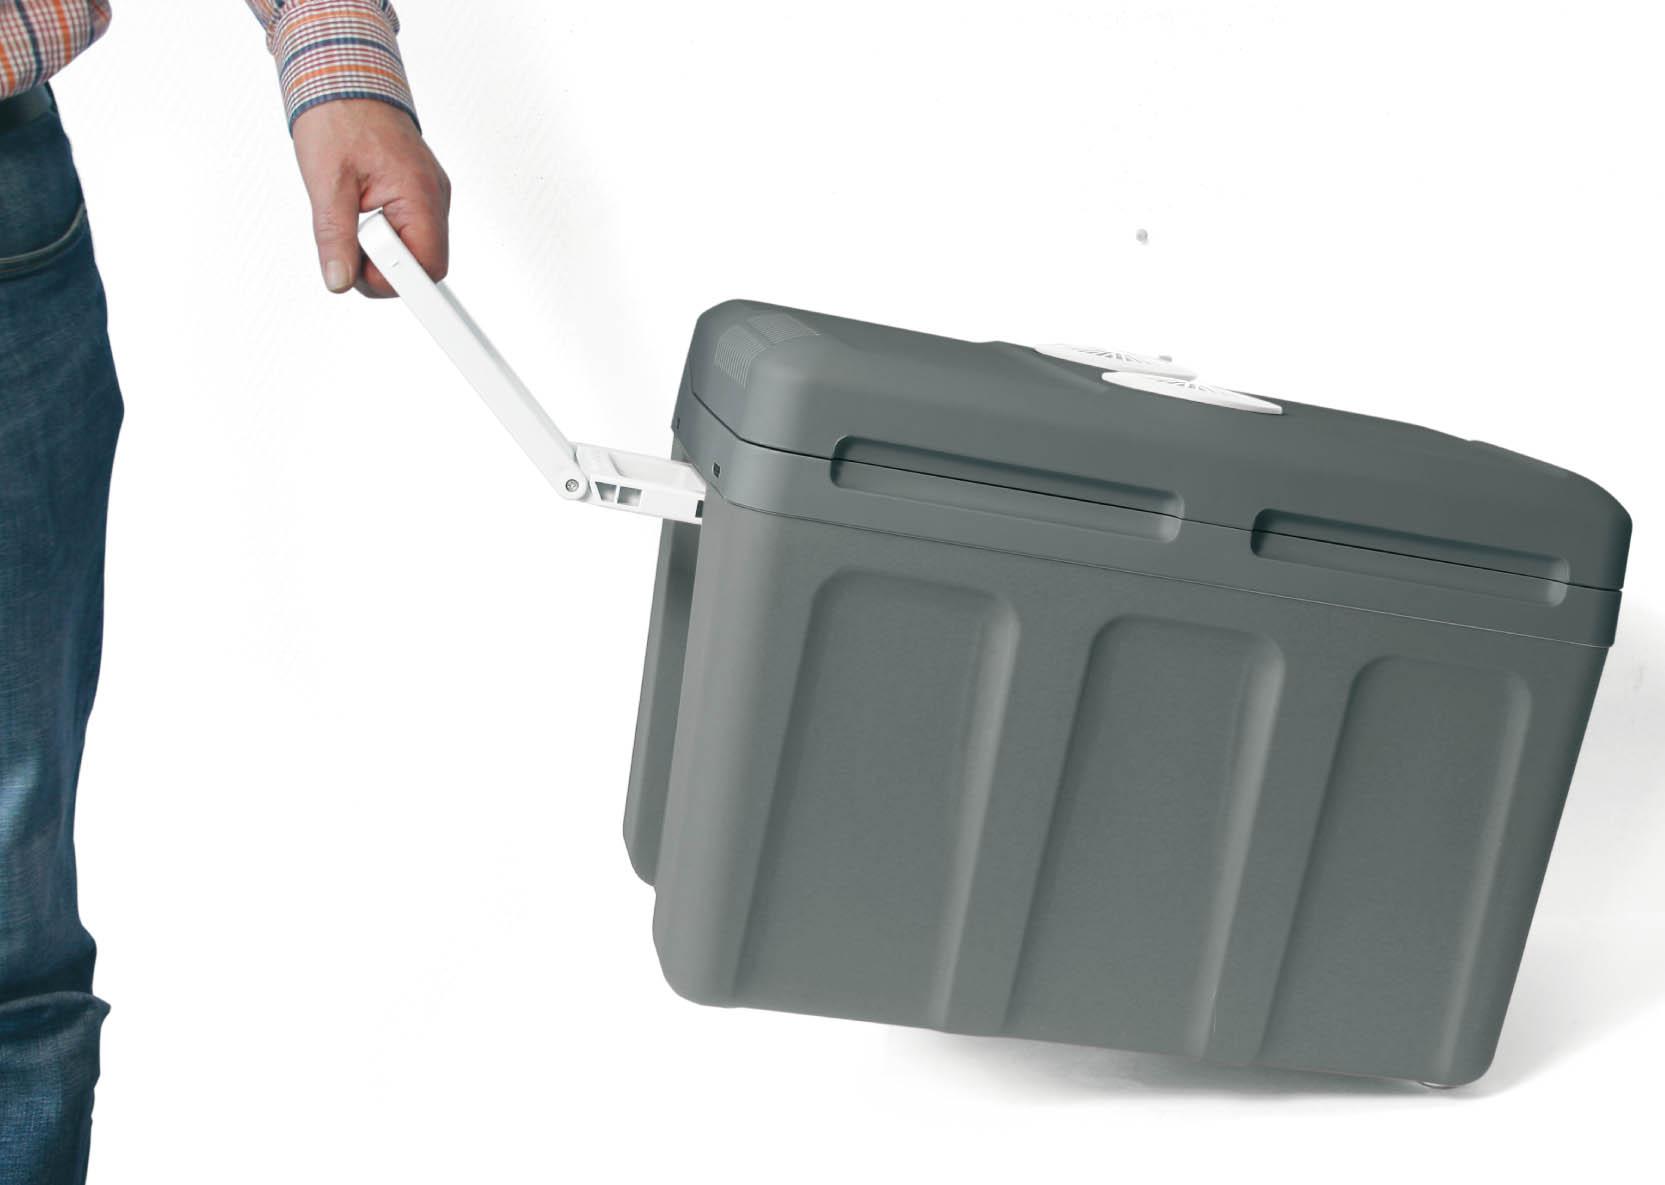 Kühlschrank Auto Zigarettenanzünder : Thermoelektrische kühlbox 12v 230v u2022 40l dino kraftpaket